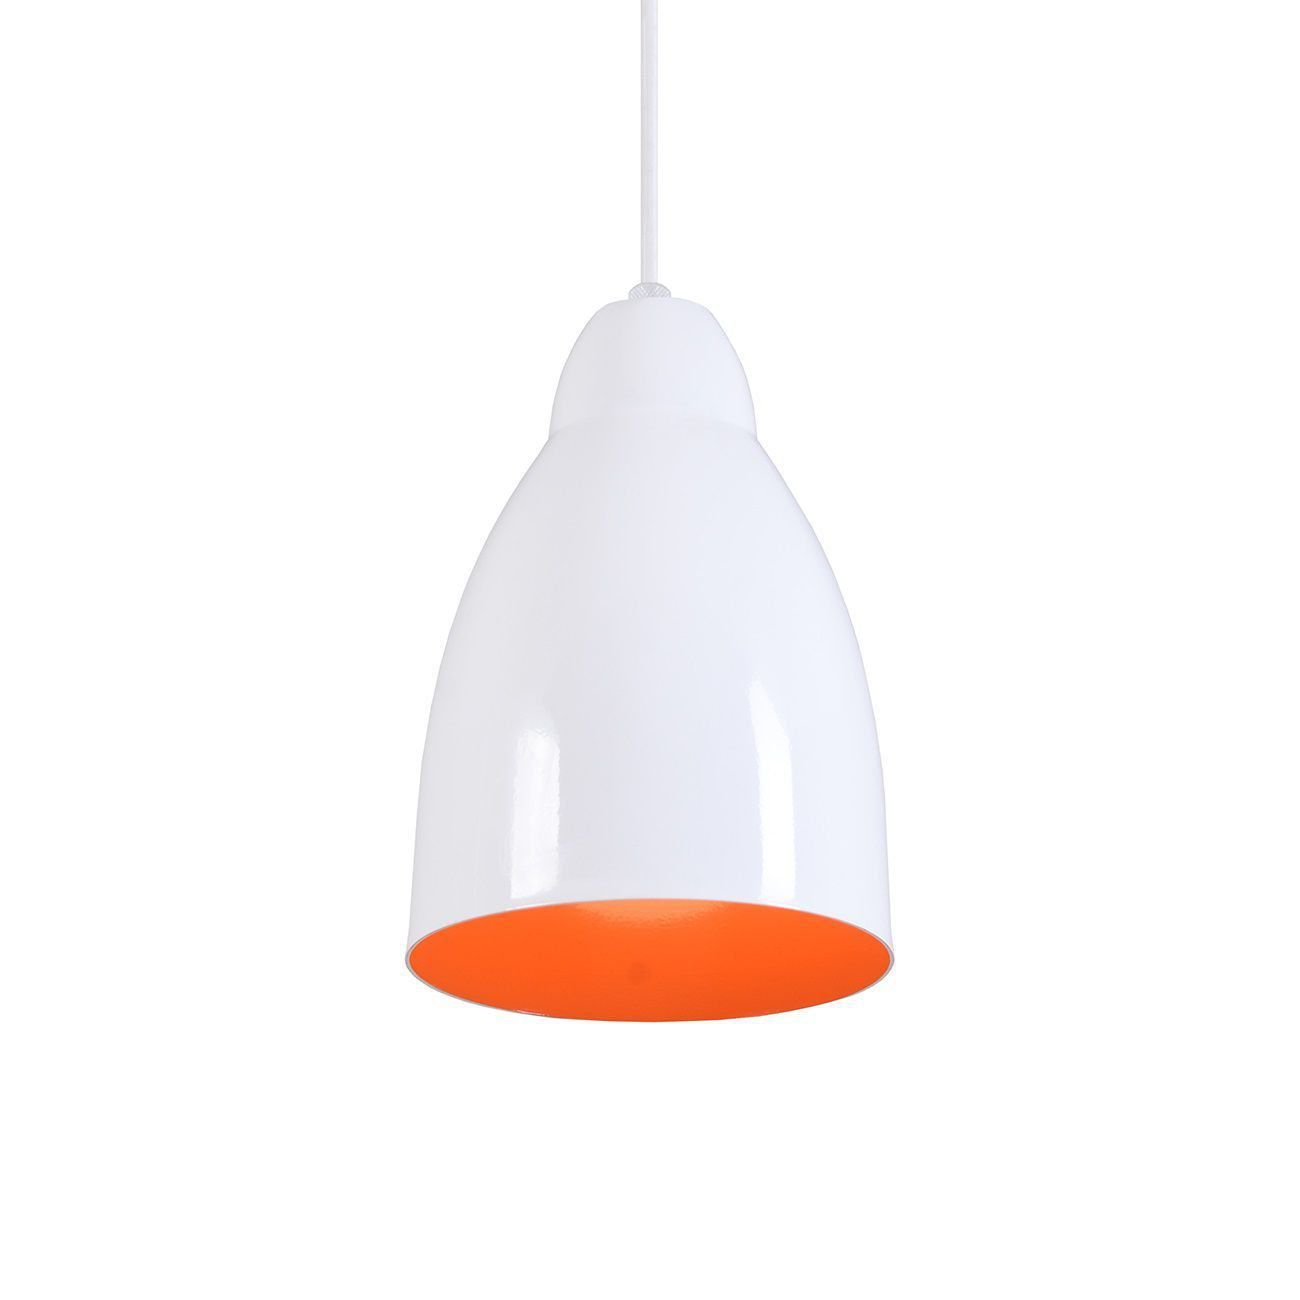 Pendente Bala Luminária Lustre Alumínio Branco Brilhante C/ Laranja - Rei Da Iluminação